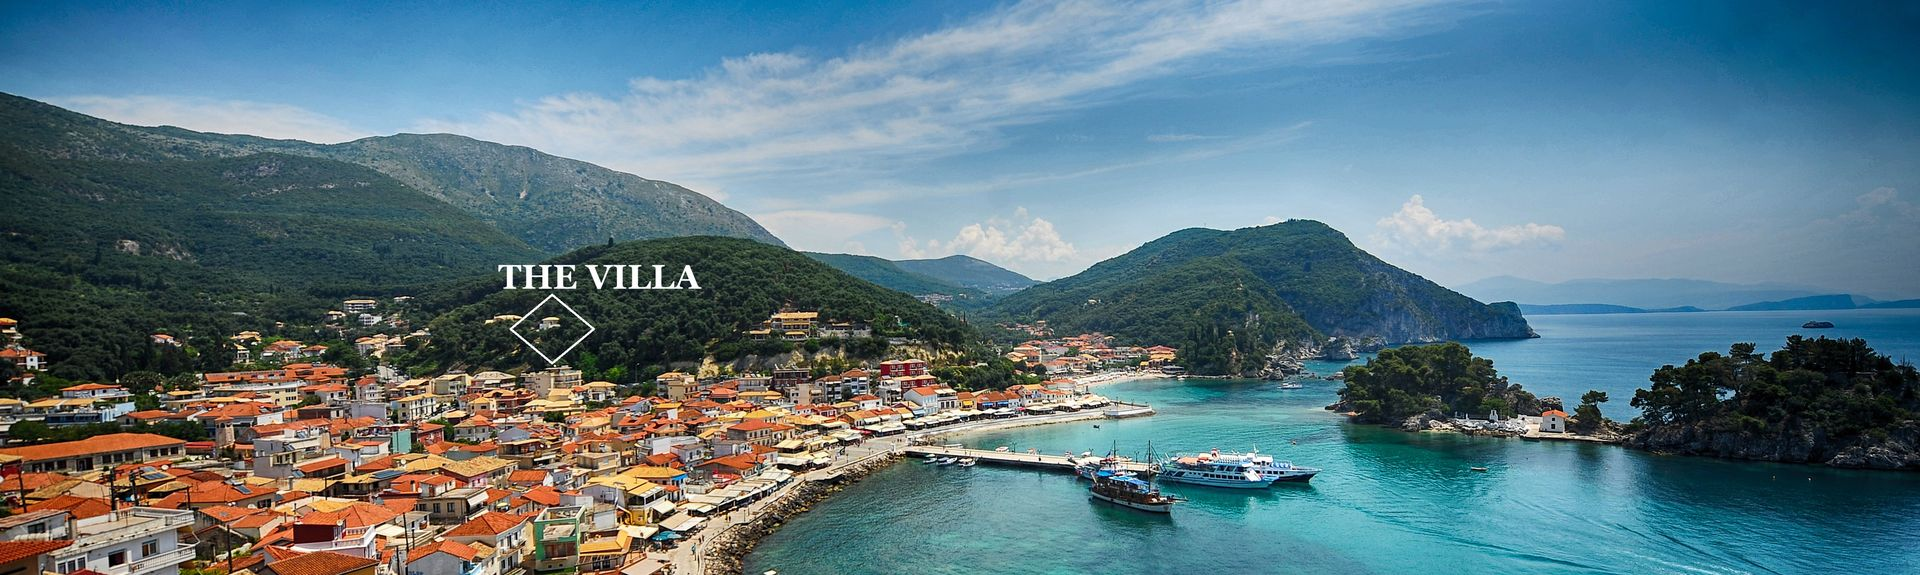 Margariti, Epirus - Western Macedonia, Greece